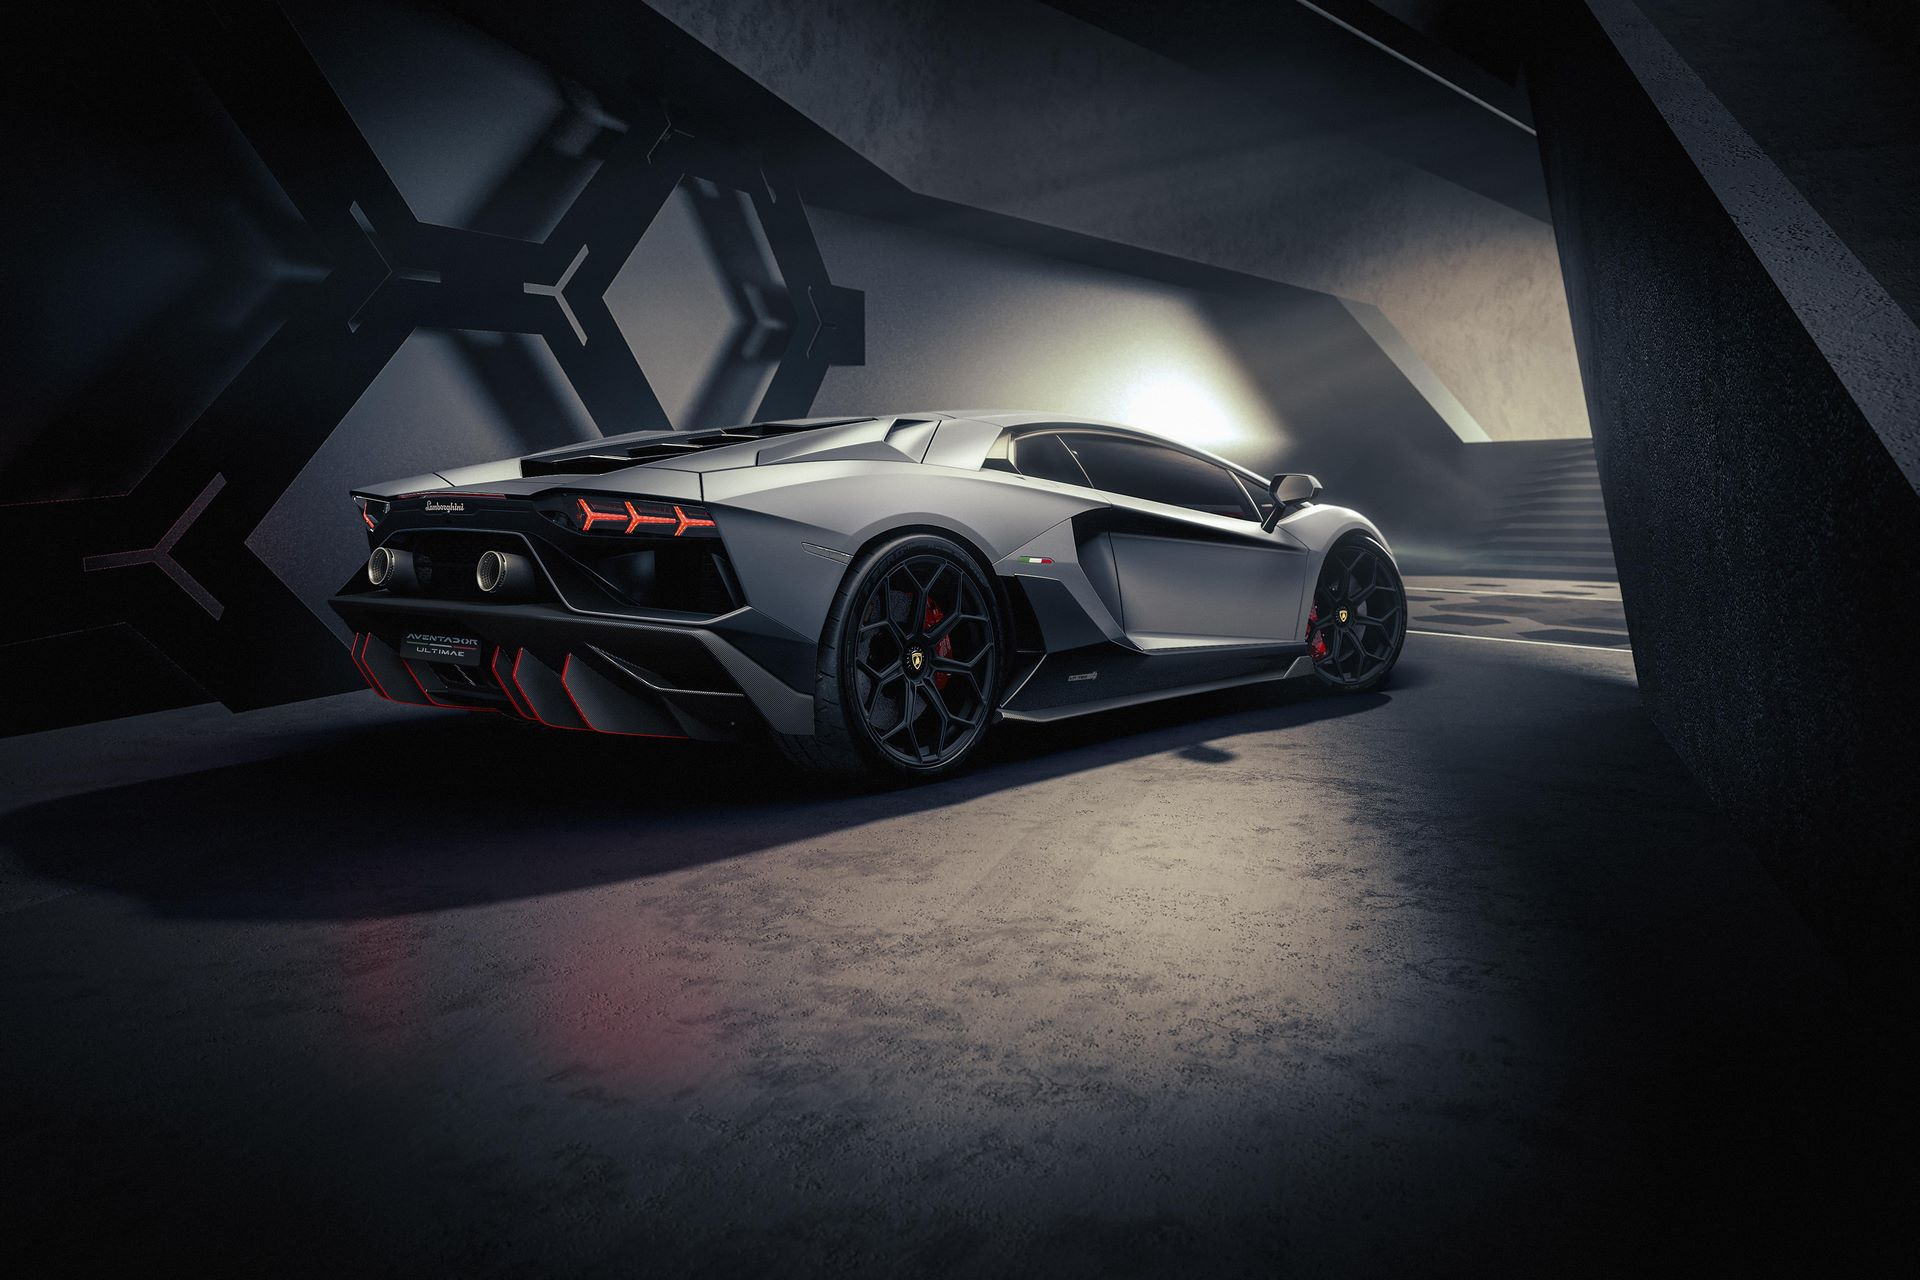 Lamborghini-Aventador-LP780-4-Ultimae-17